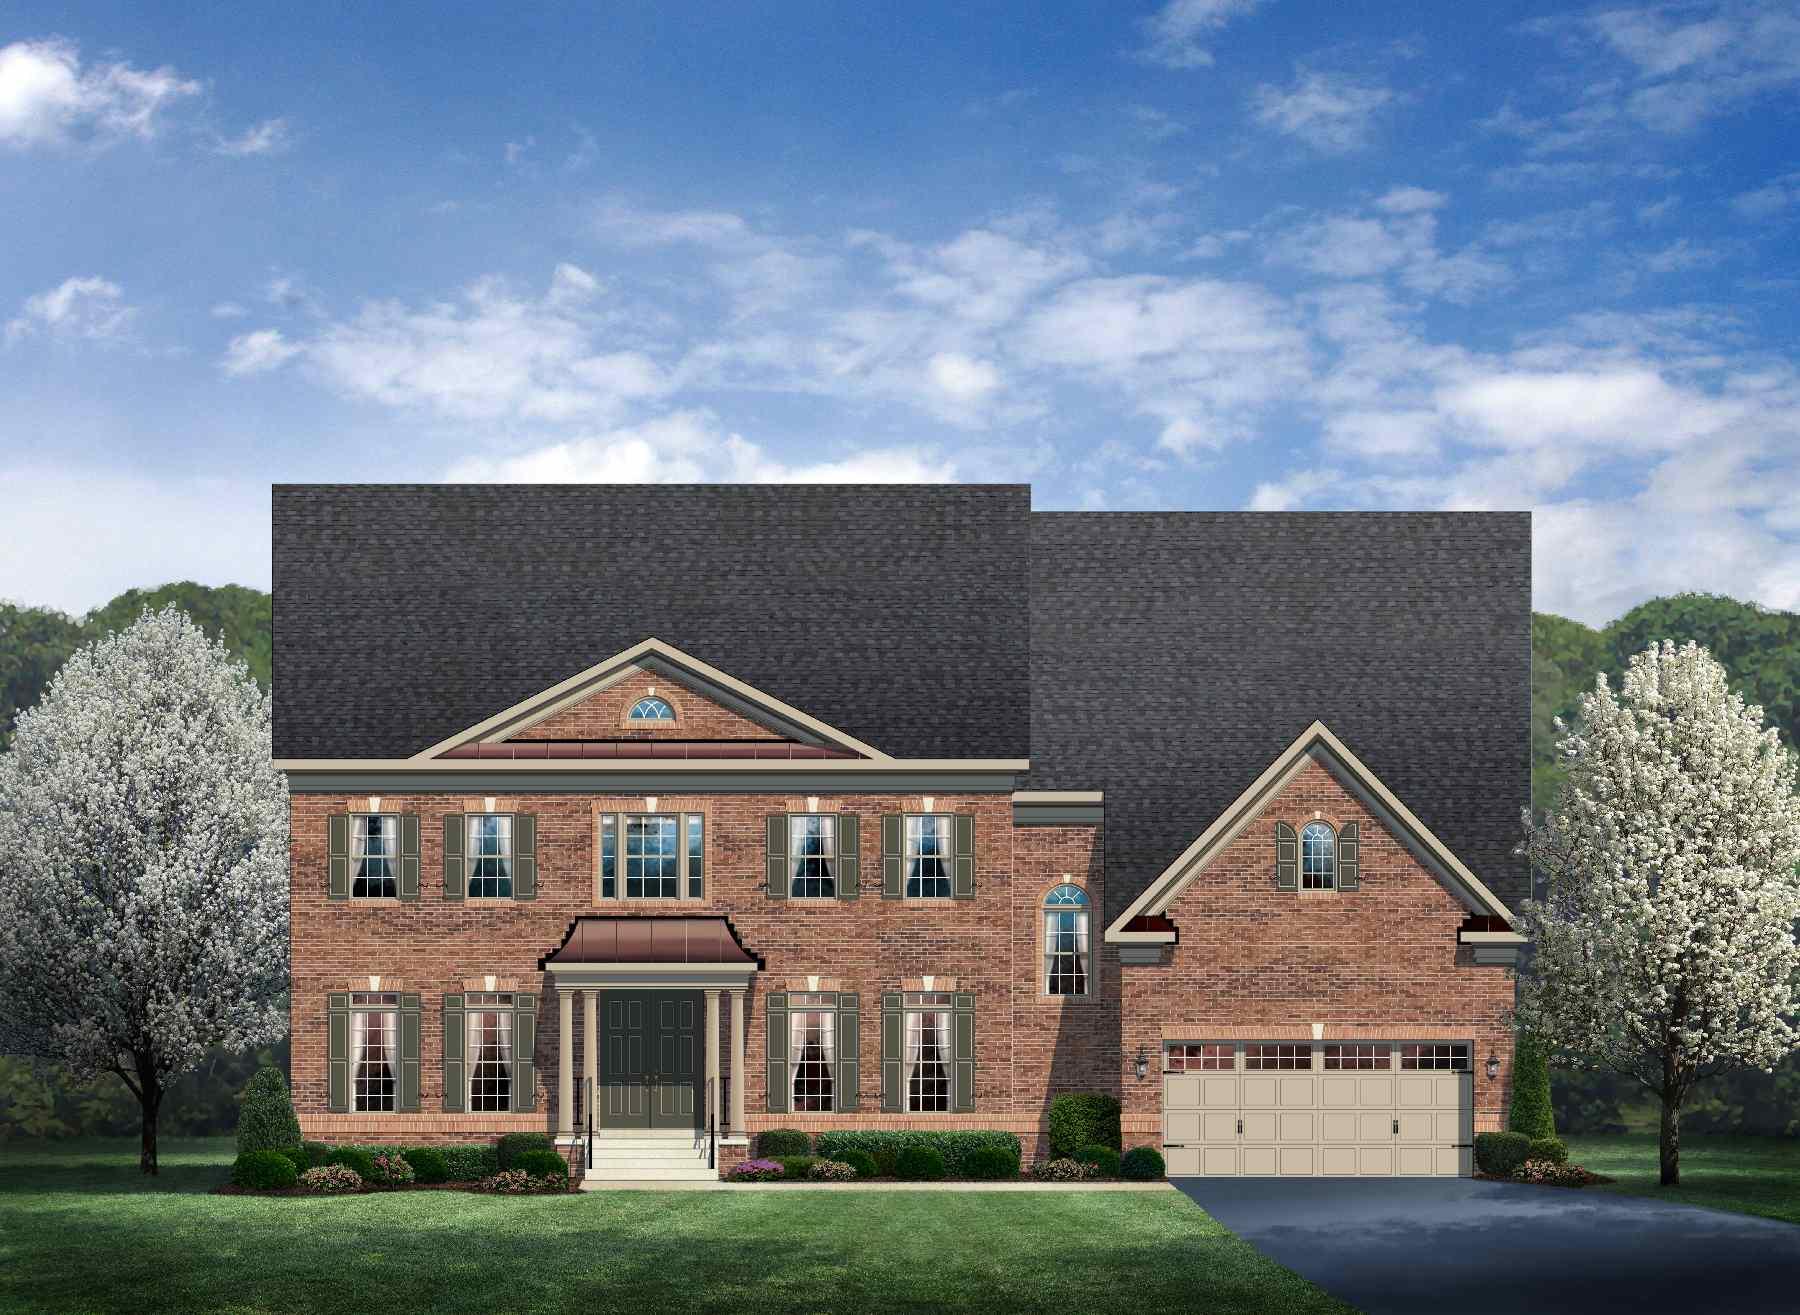 New Mount Vernon Ii Home Model For Sale Nvhomes